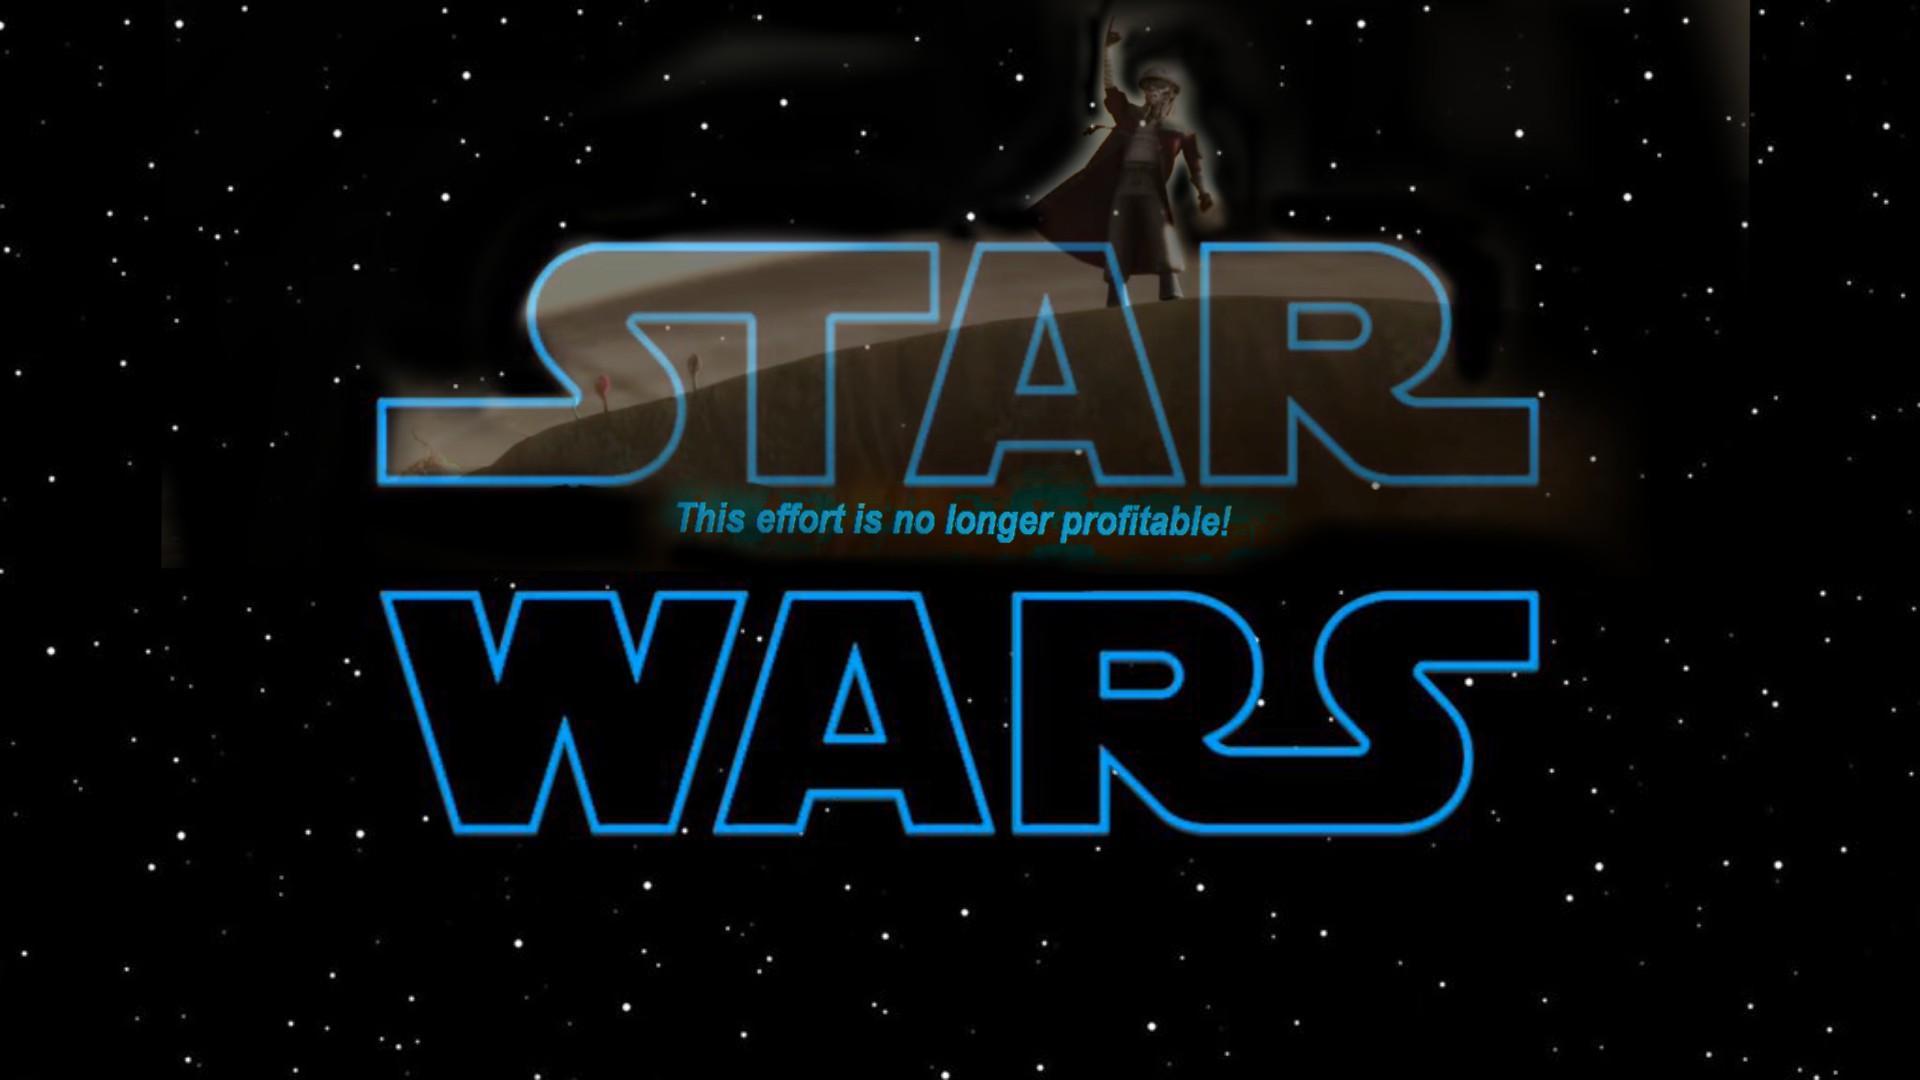 29 Star Wars Episode 9 Wallpapers On Wallpapersafari